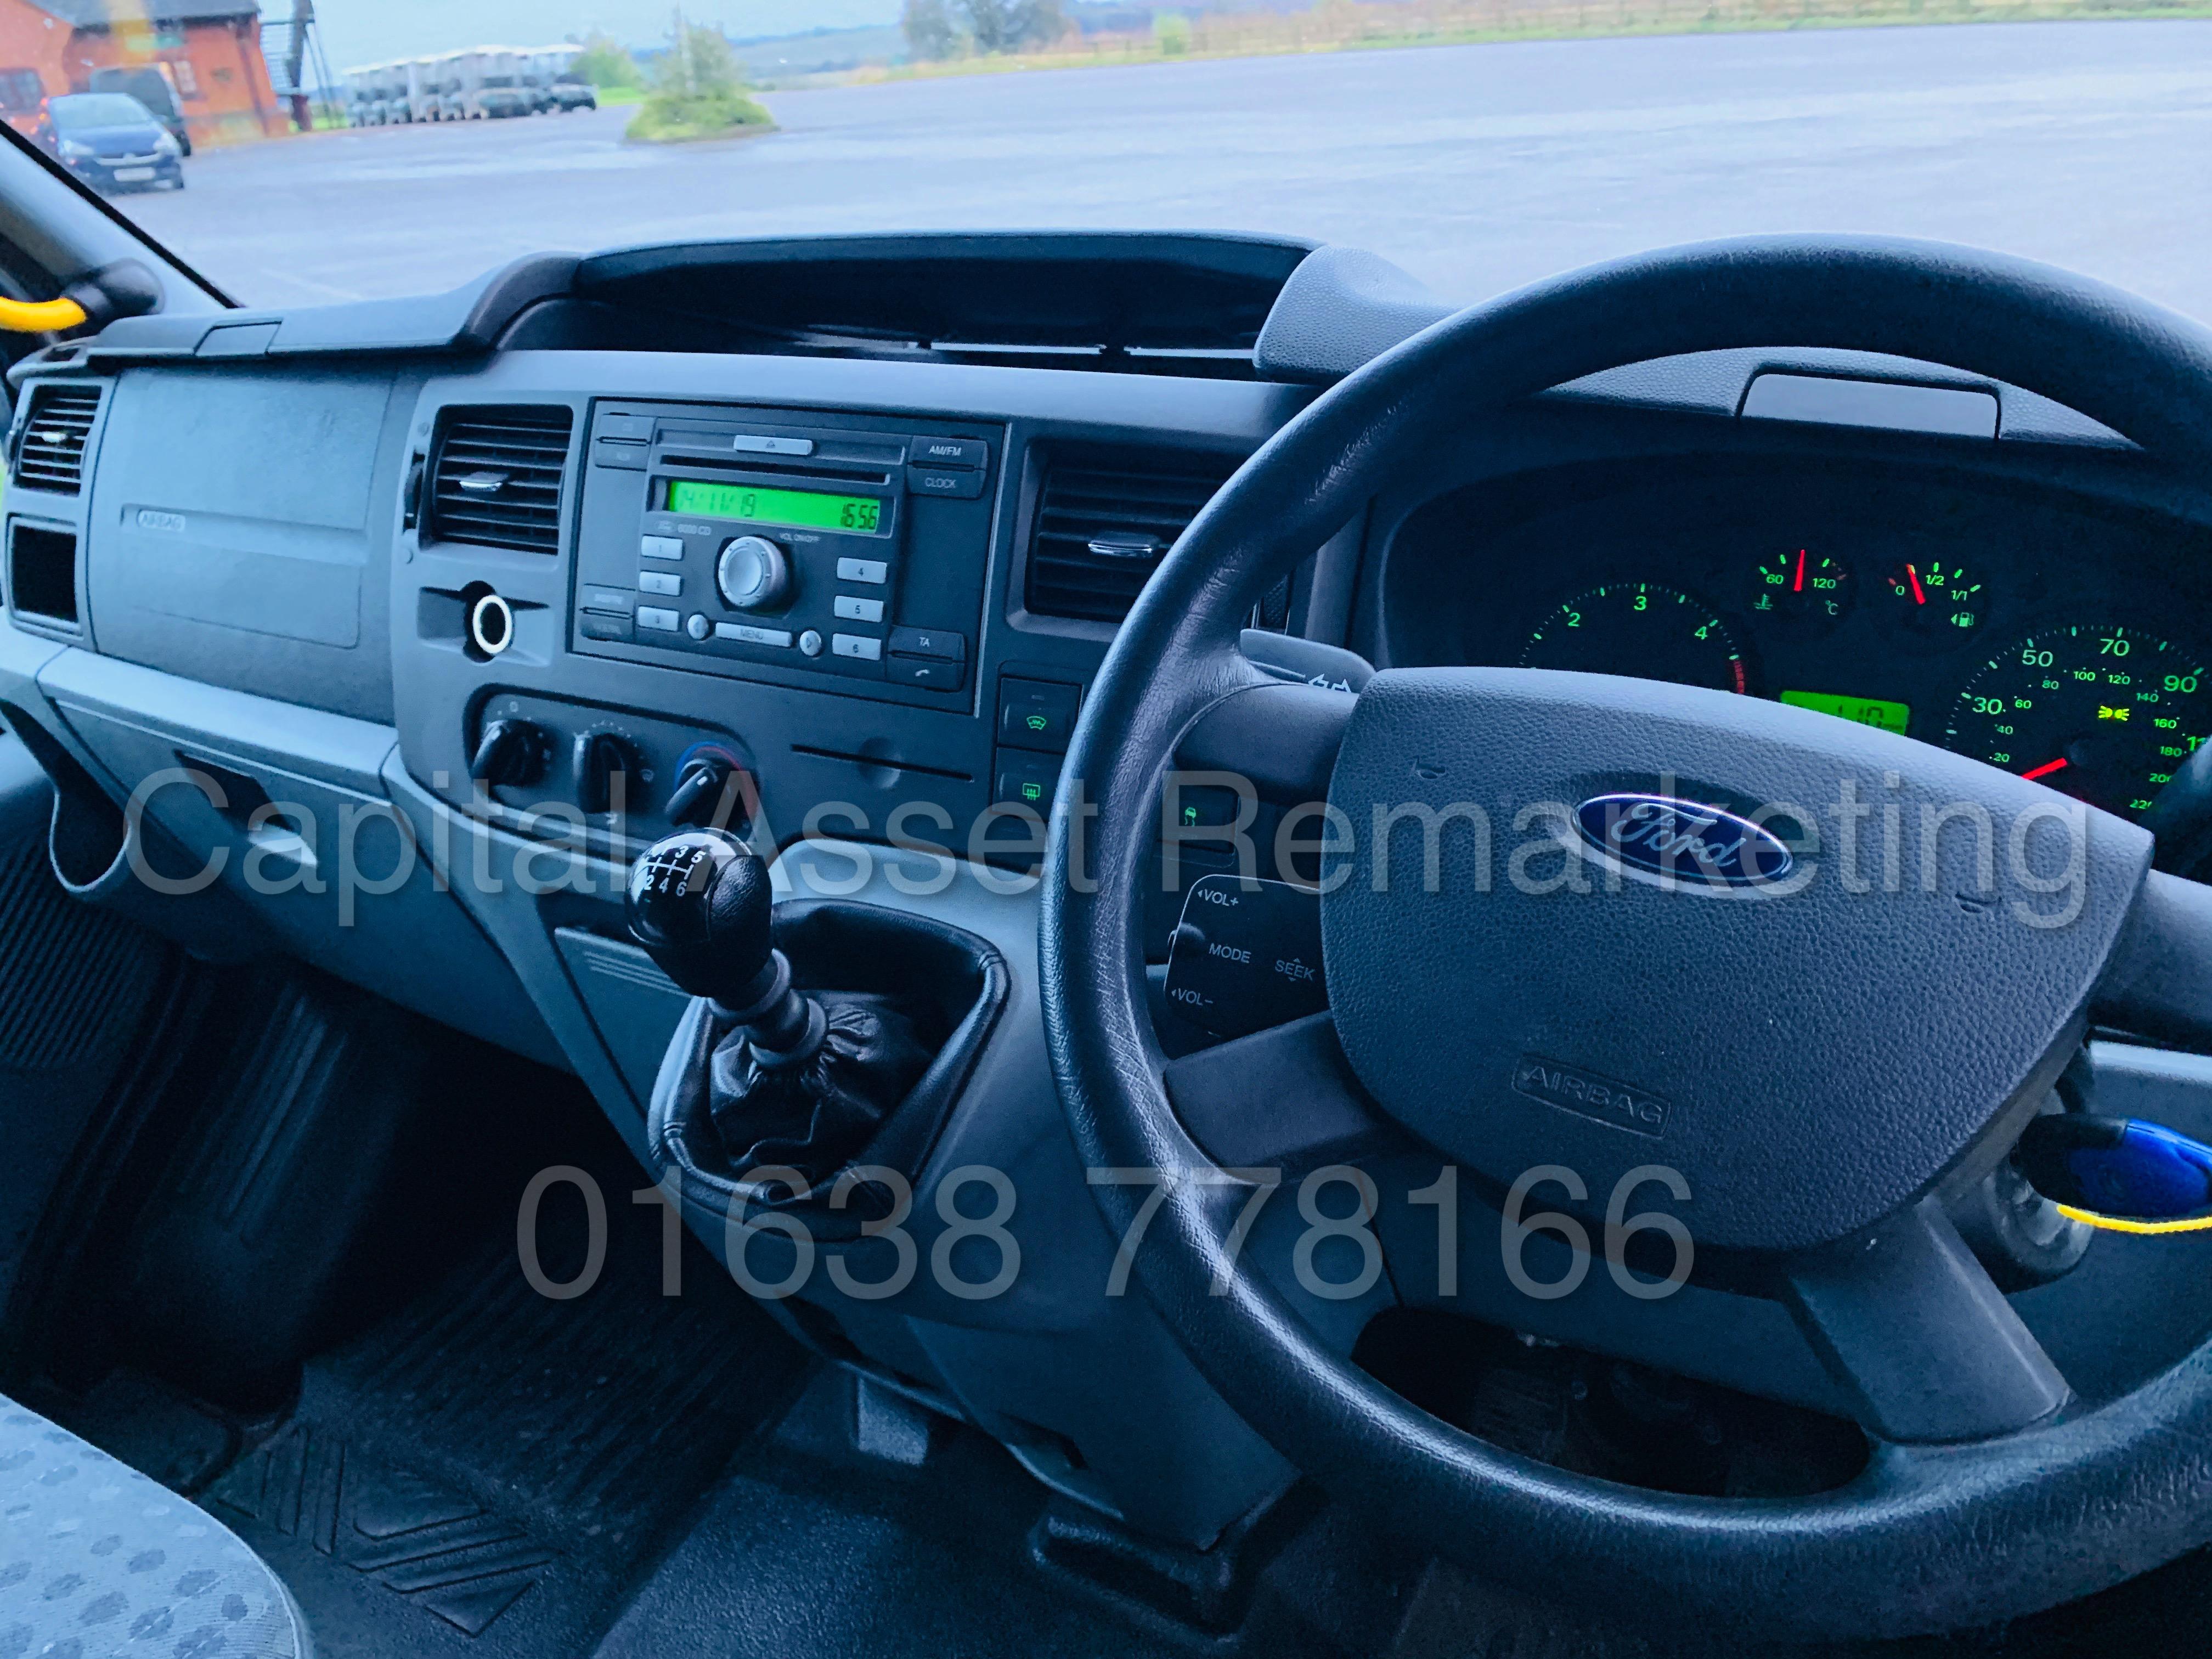 FORD TRANSIT 135 T430 RWD *XLWB -17 SEATER MINI-BUS* (2013) '2.2 TDCI - 135 BHP - 6 SPEED' (1 OWNER) - Image 35 of 43